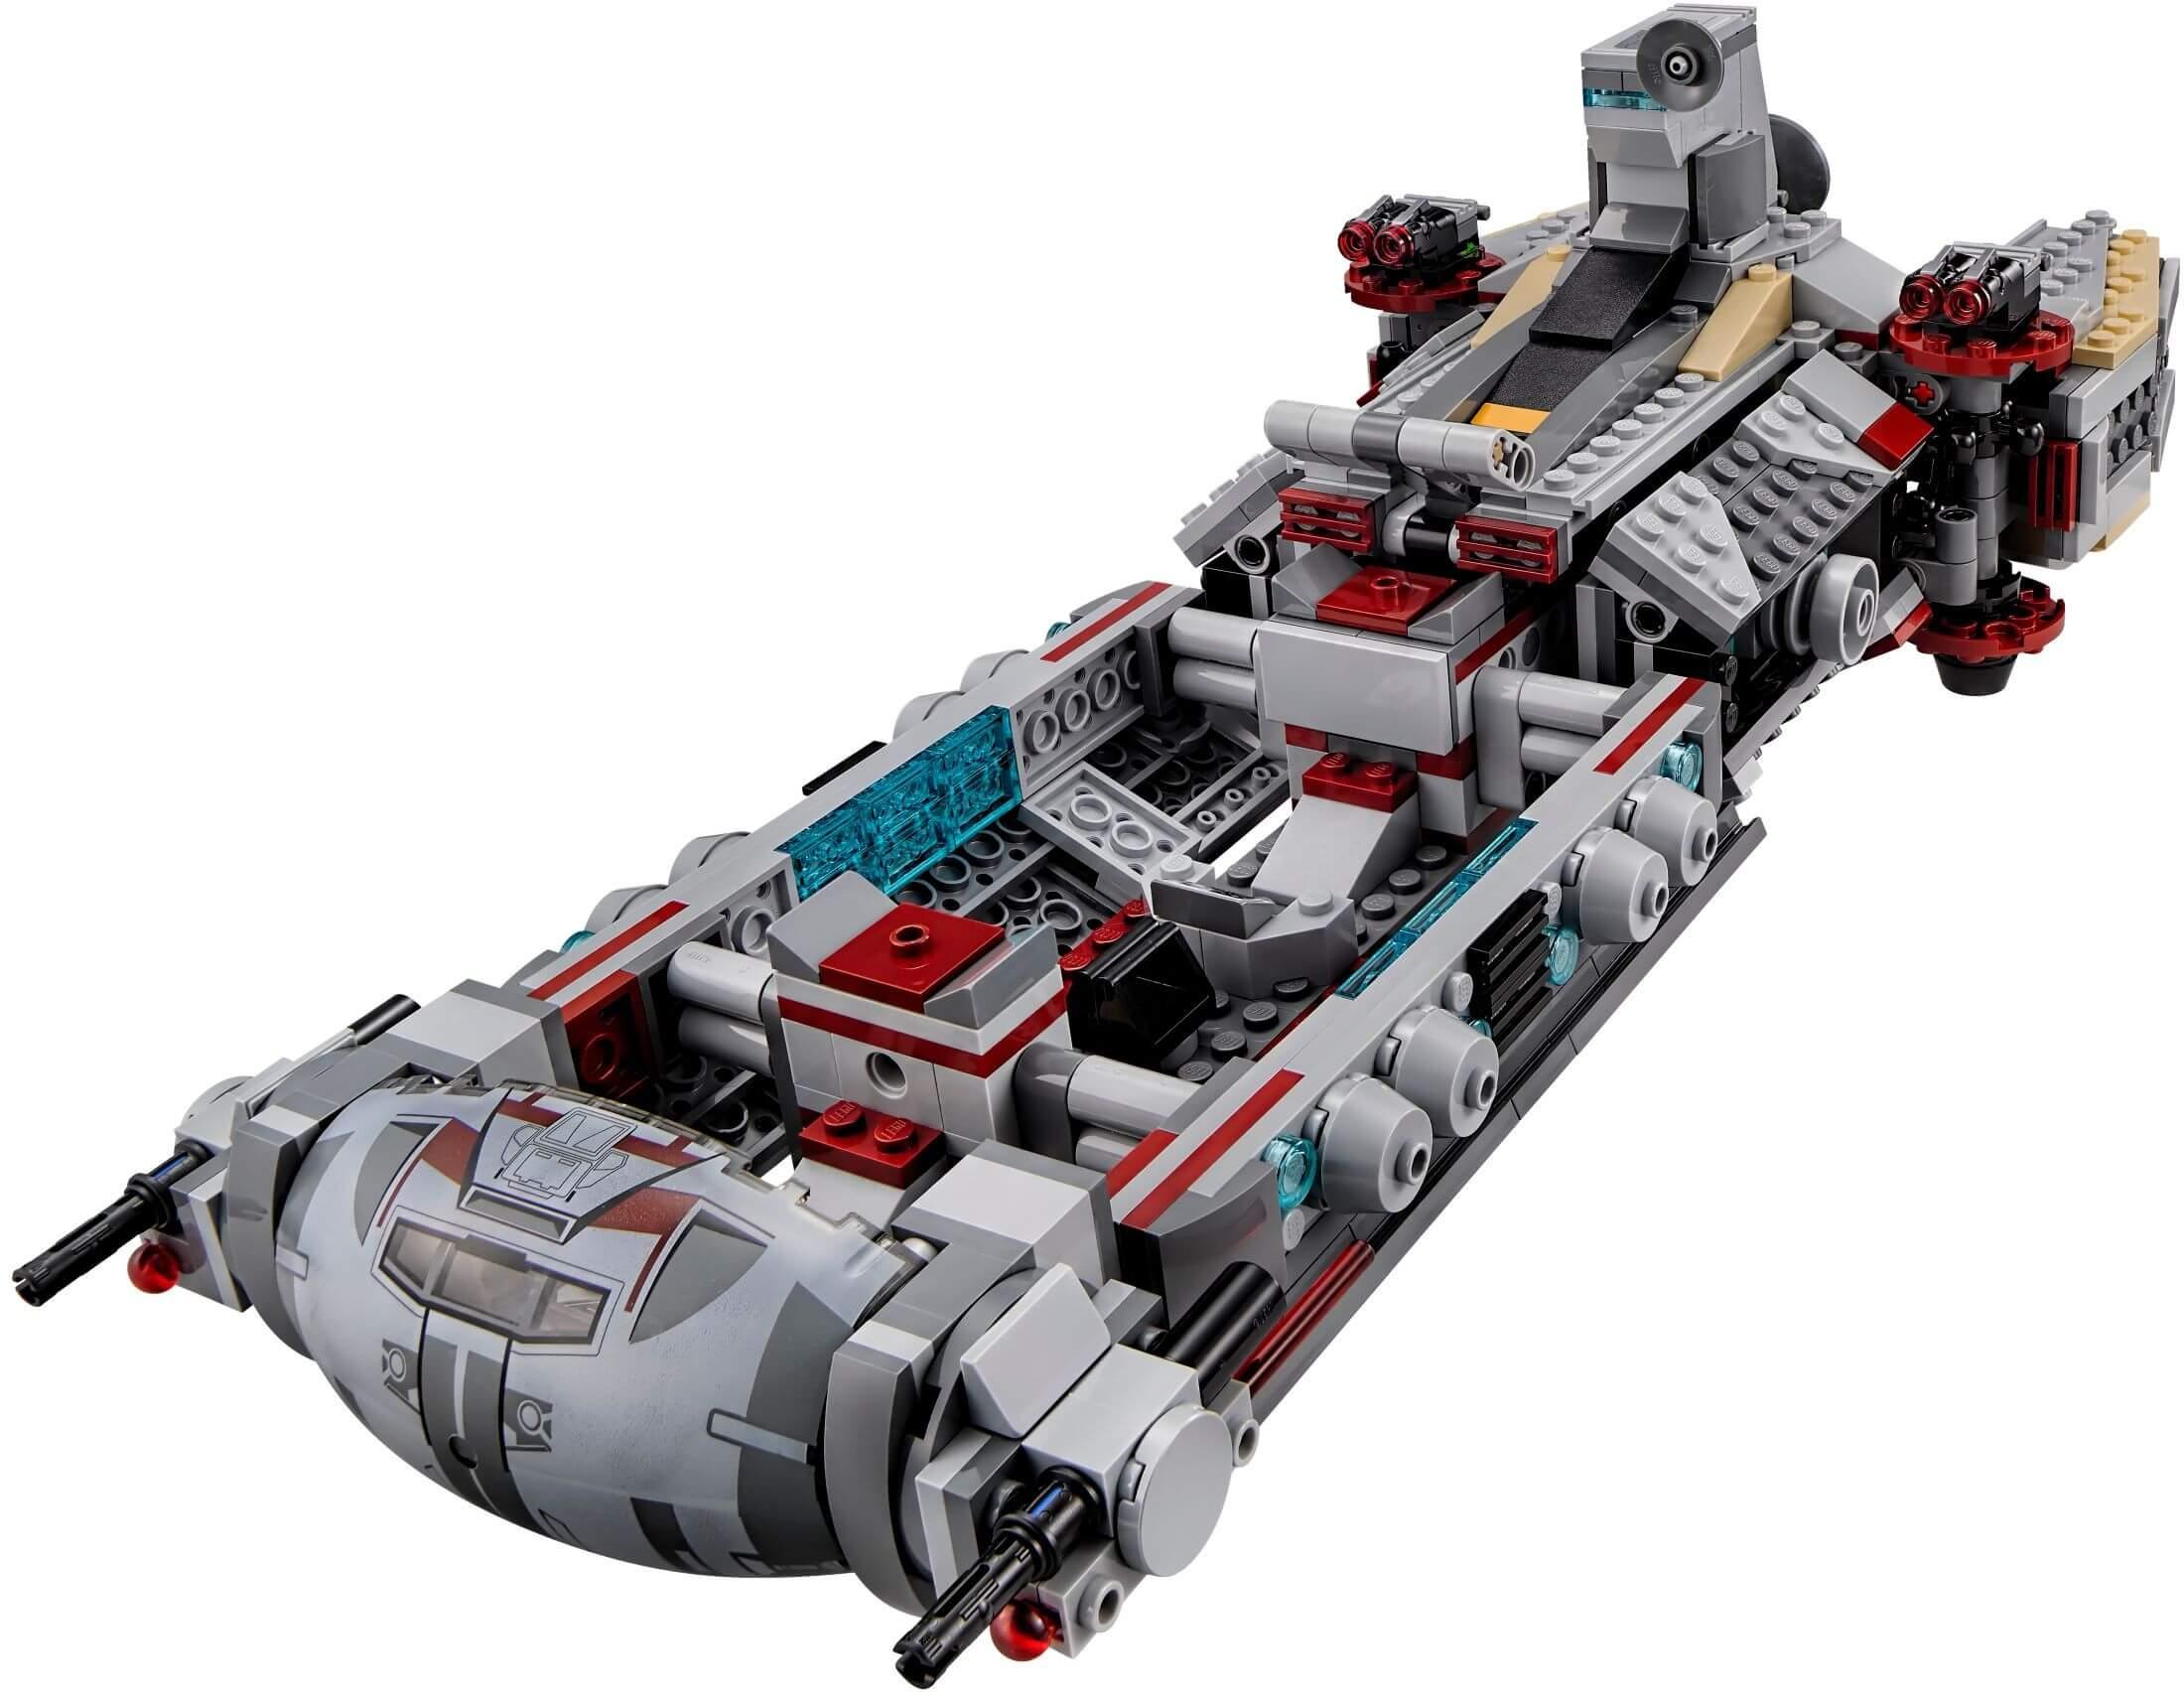 Mua đồ chơi LEGO 75158 - LEGO Star Wars 75158 - Chiến Hạm của Quân Nổi Dậy (LEGO Star Wars Rebel Combat Frigate 75158)